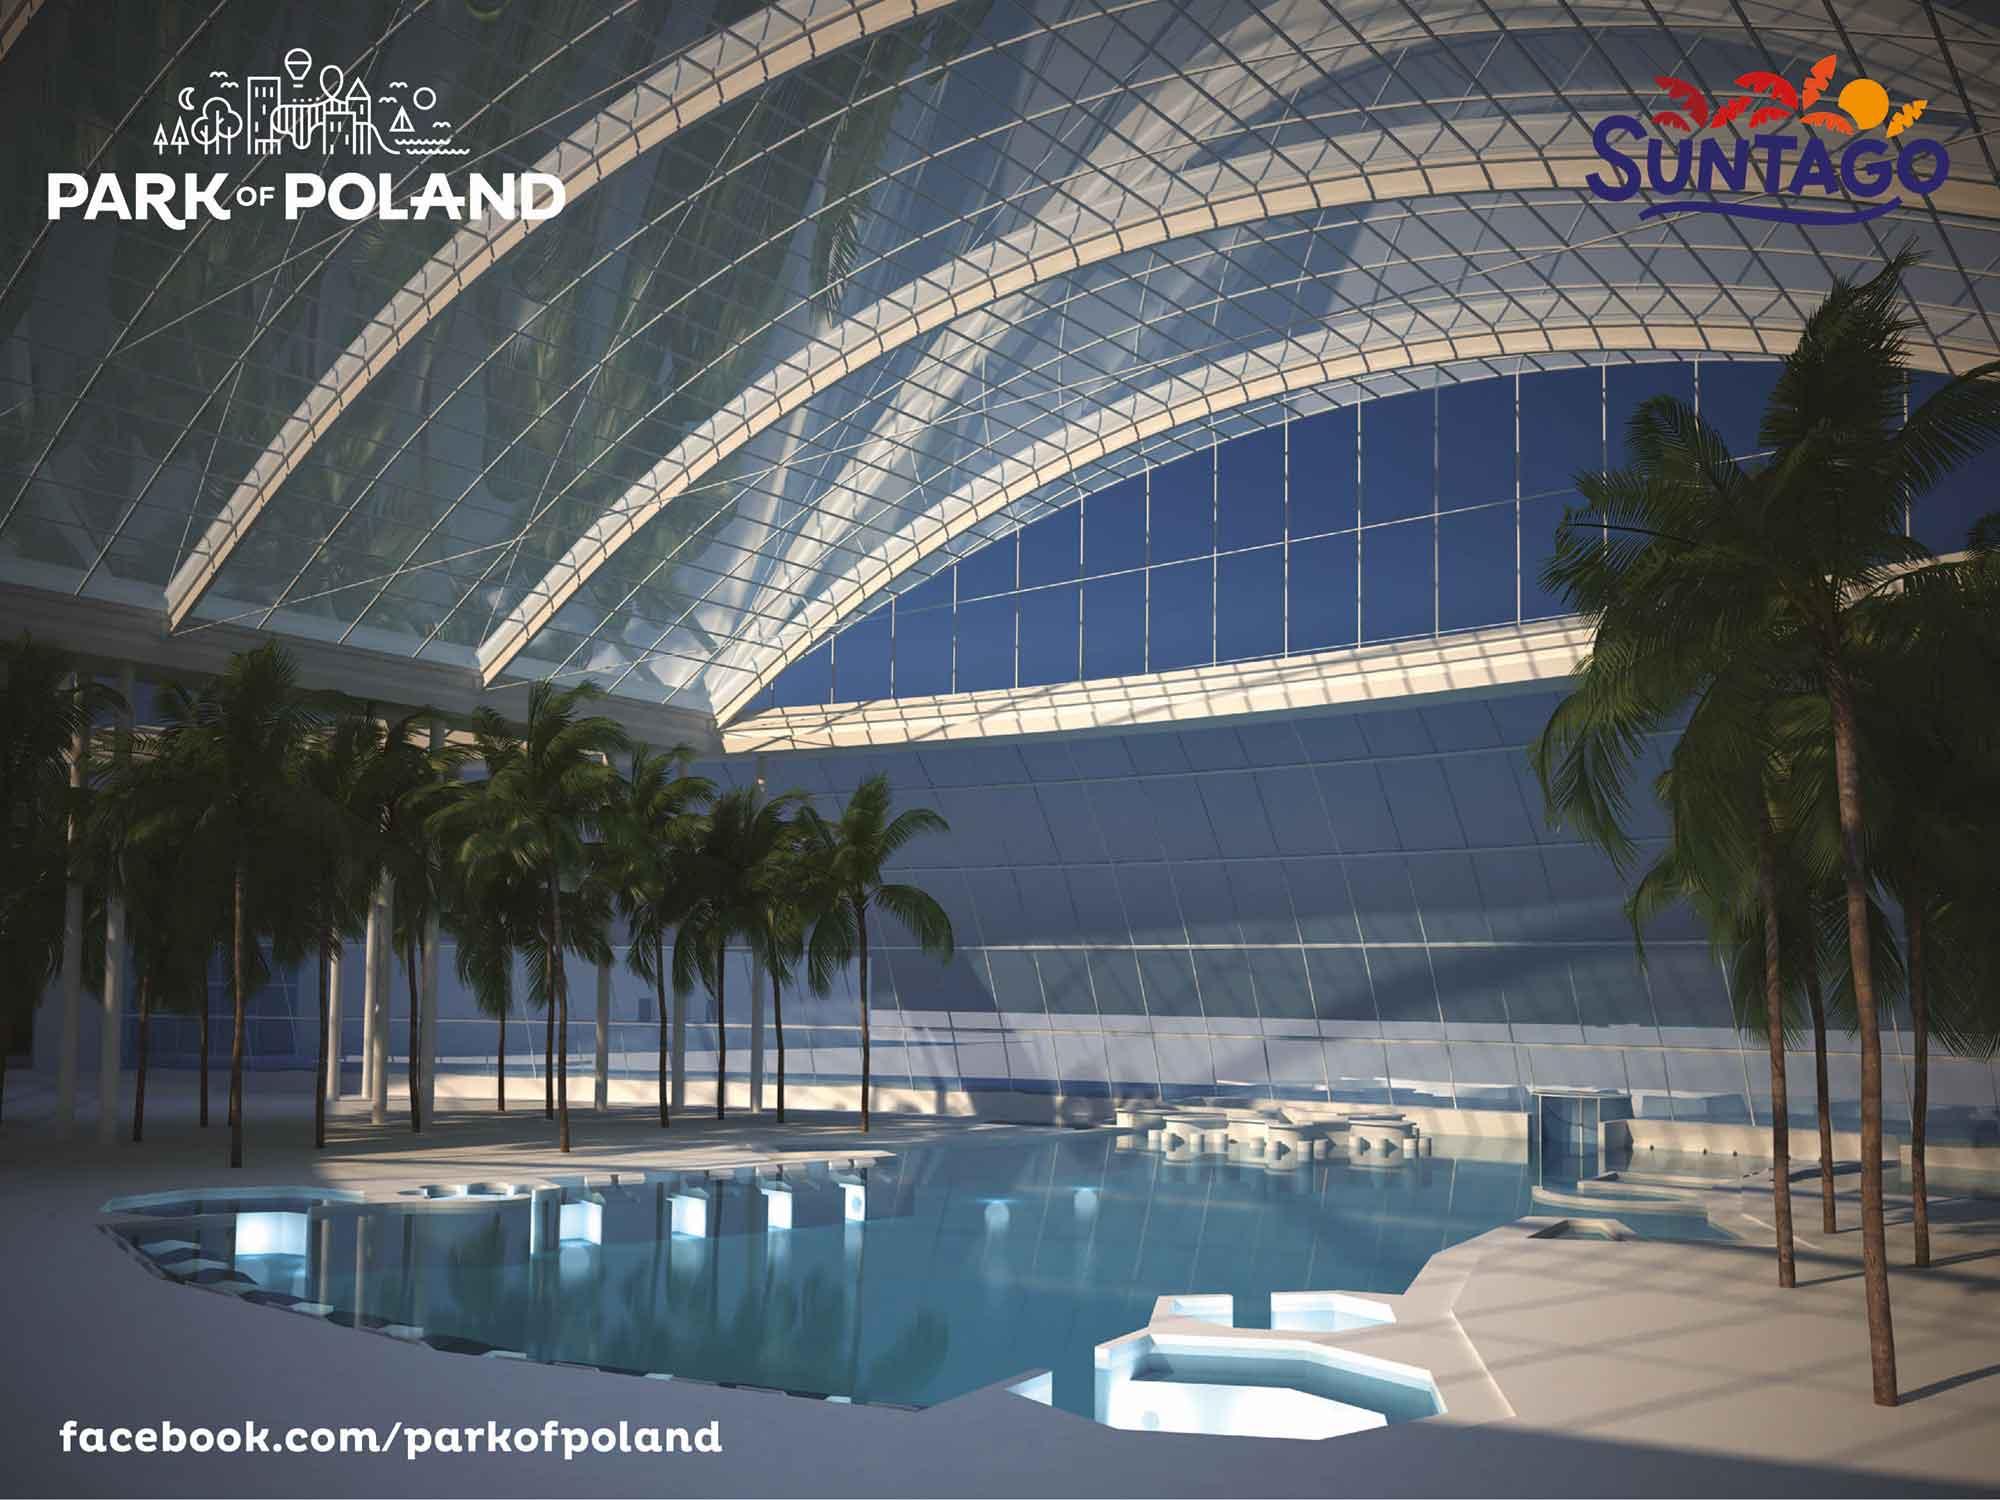 Park of Poland concept designs